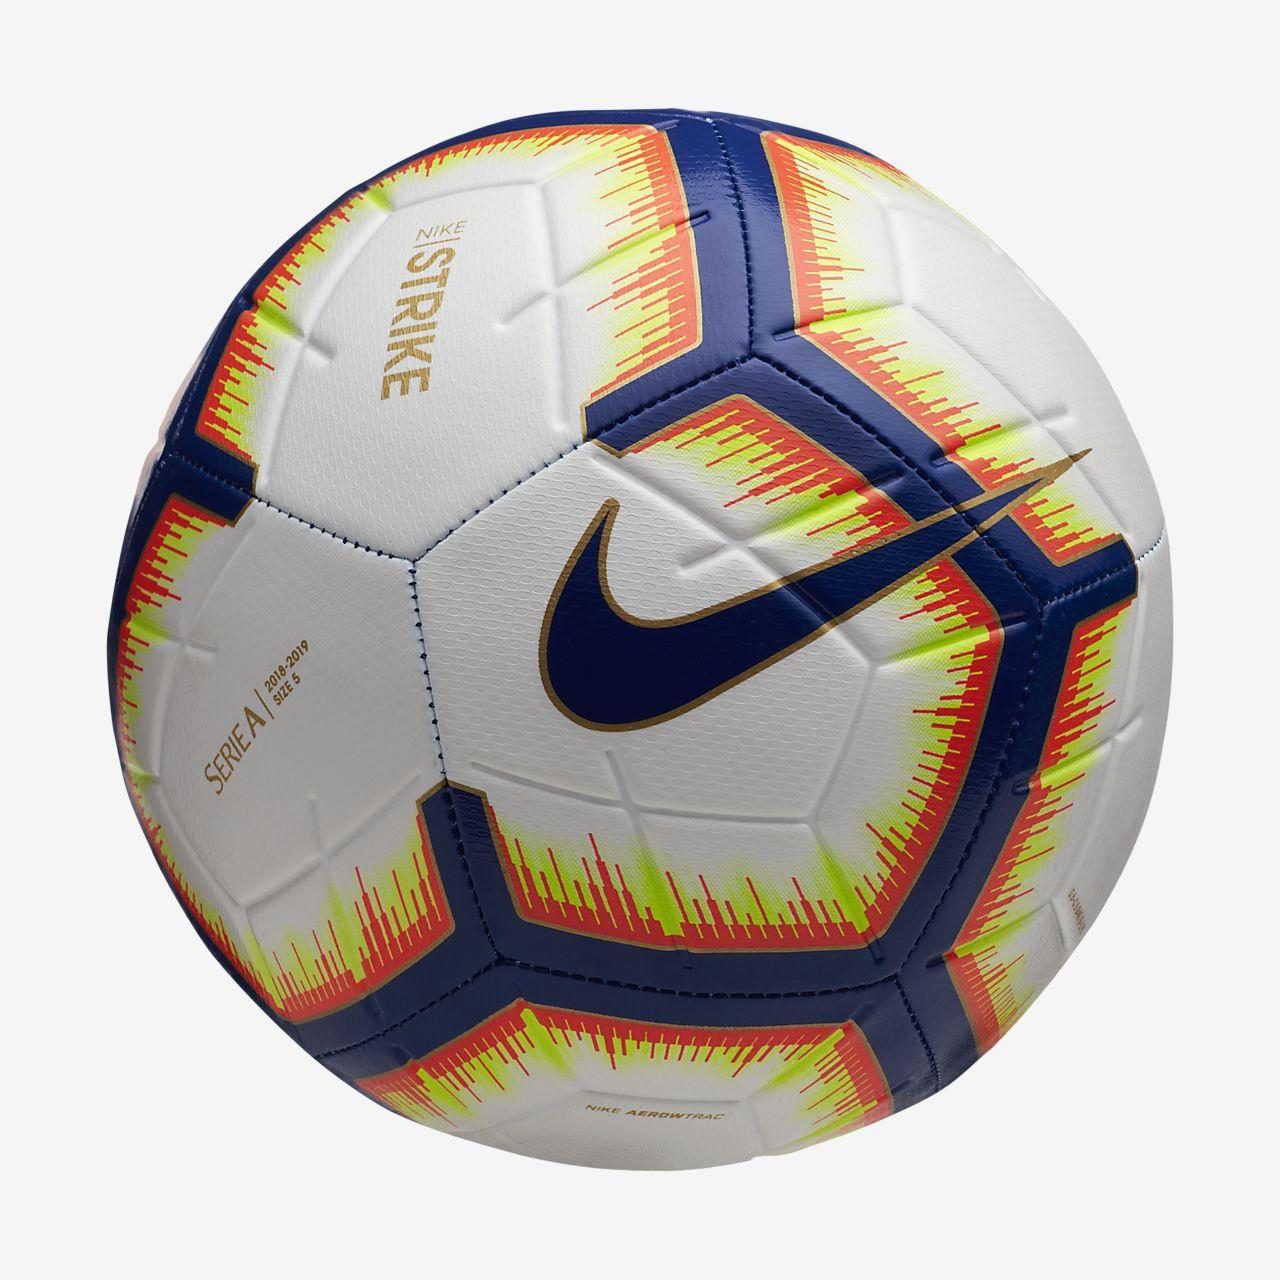 b4be32a3831c2 Serie A Strike Football. Nike.com GB